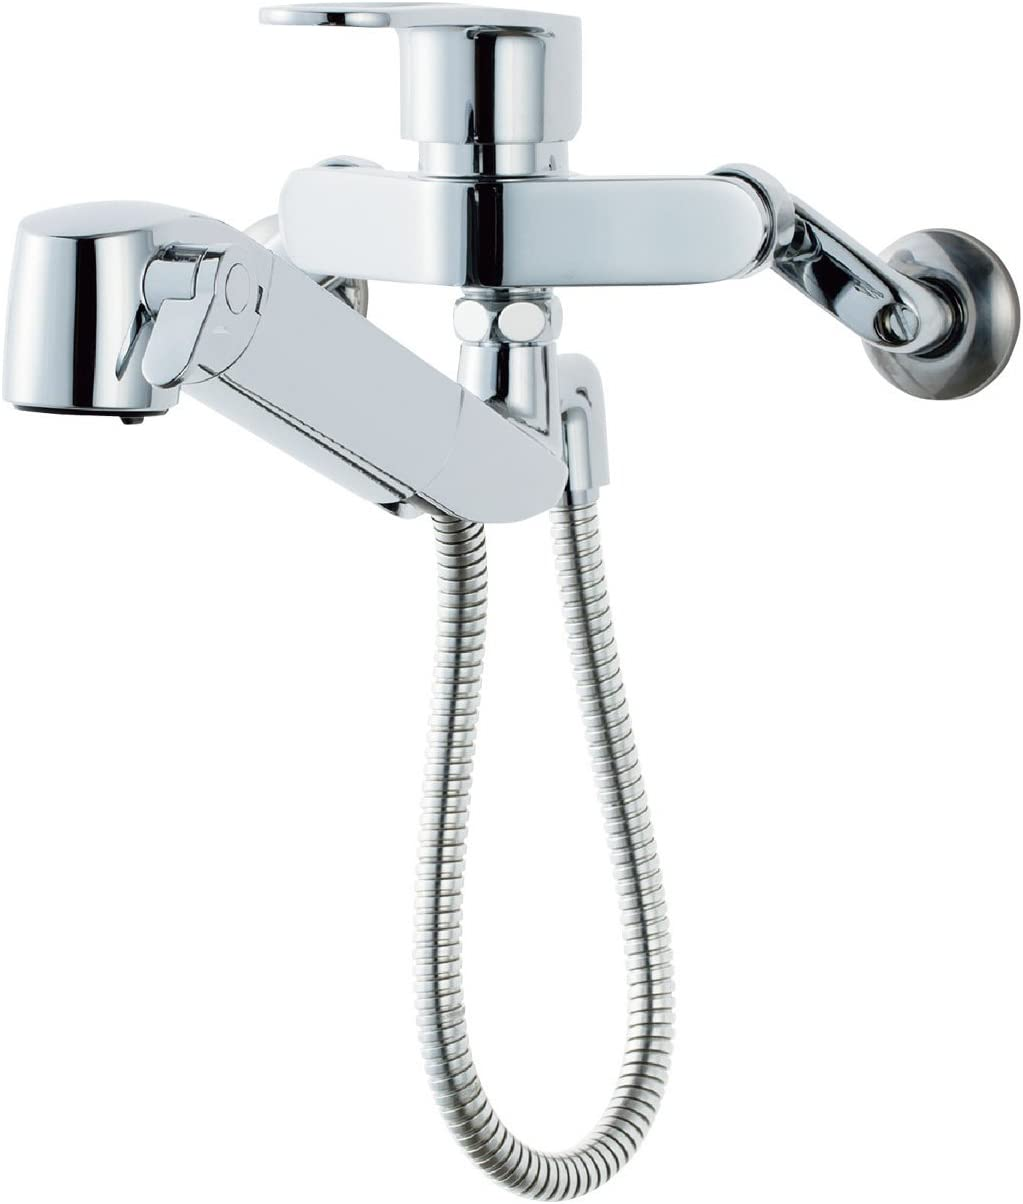 LIXIL 壁付浄水器内蔵シングルレバー混合水栓 ハンドシャワー付 RJF-865Y